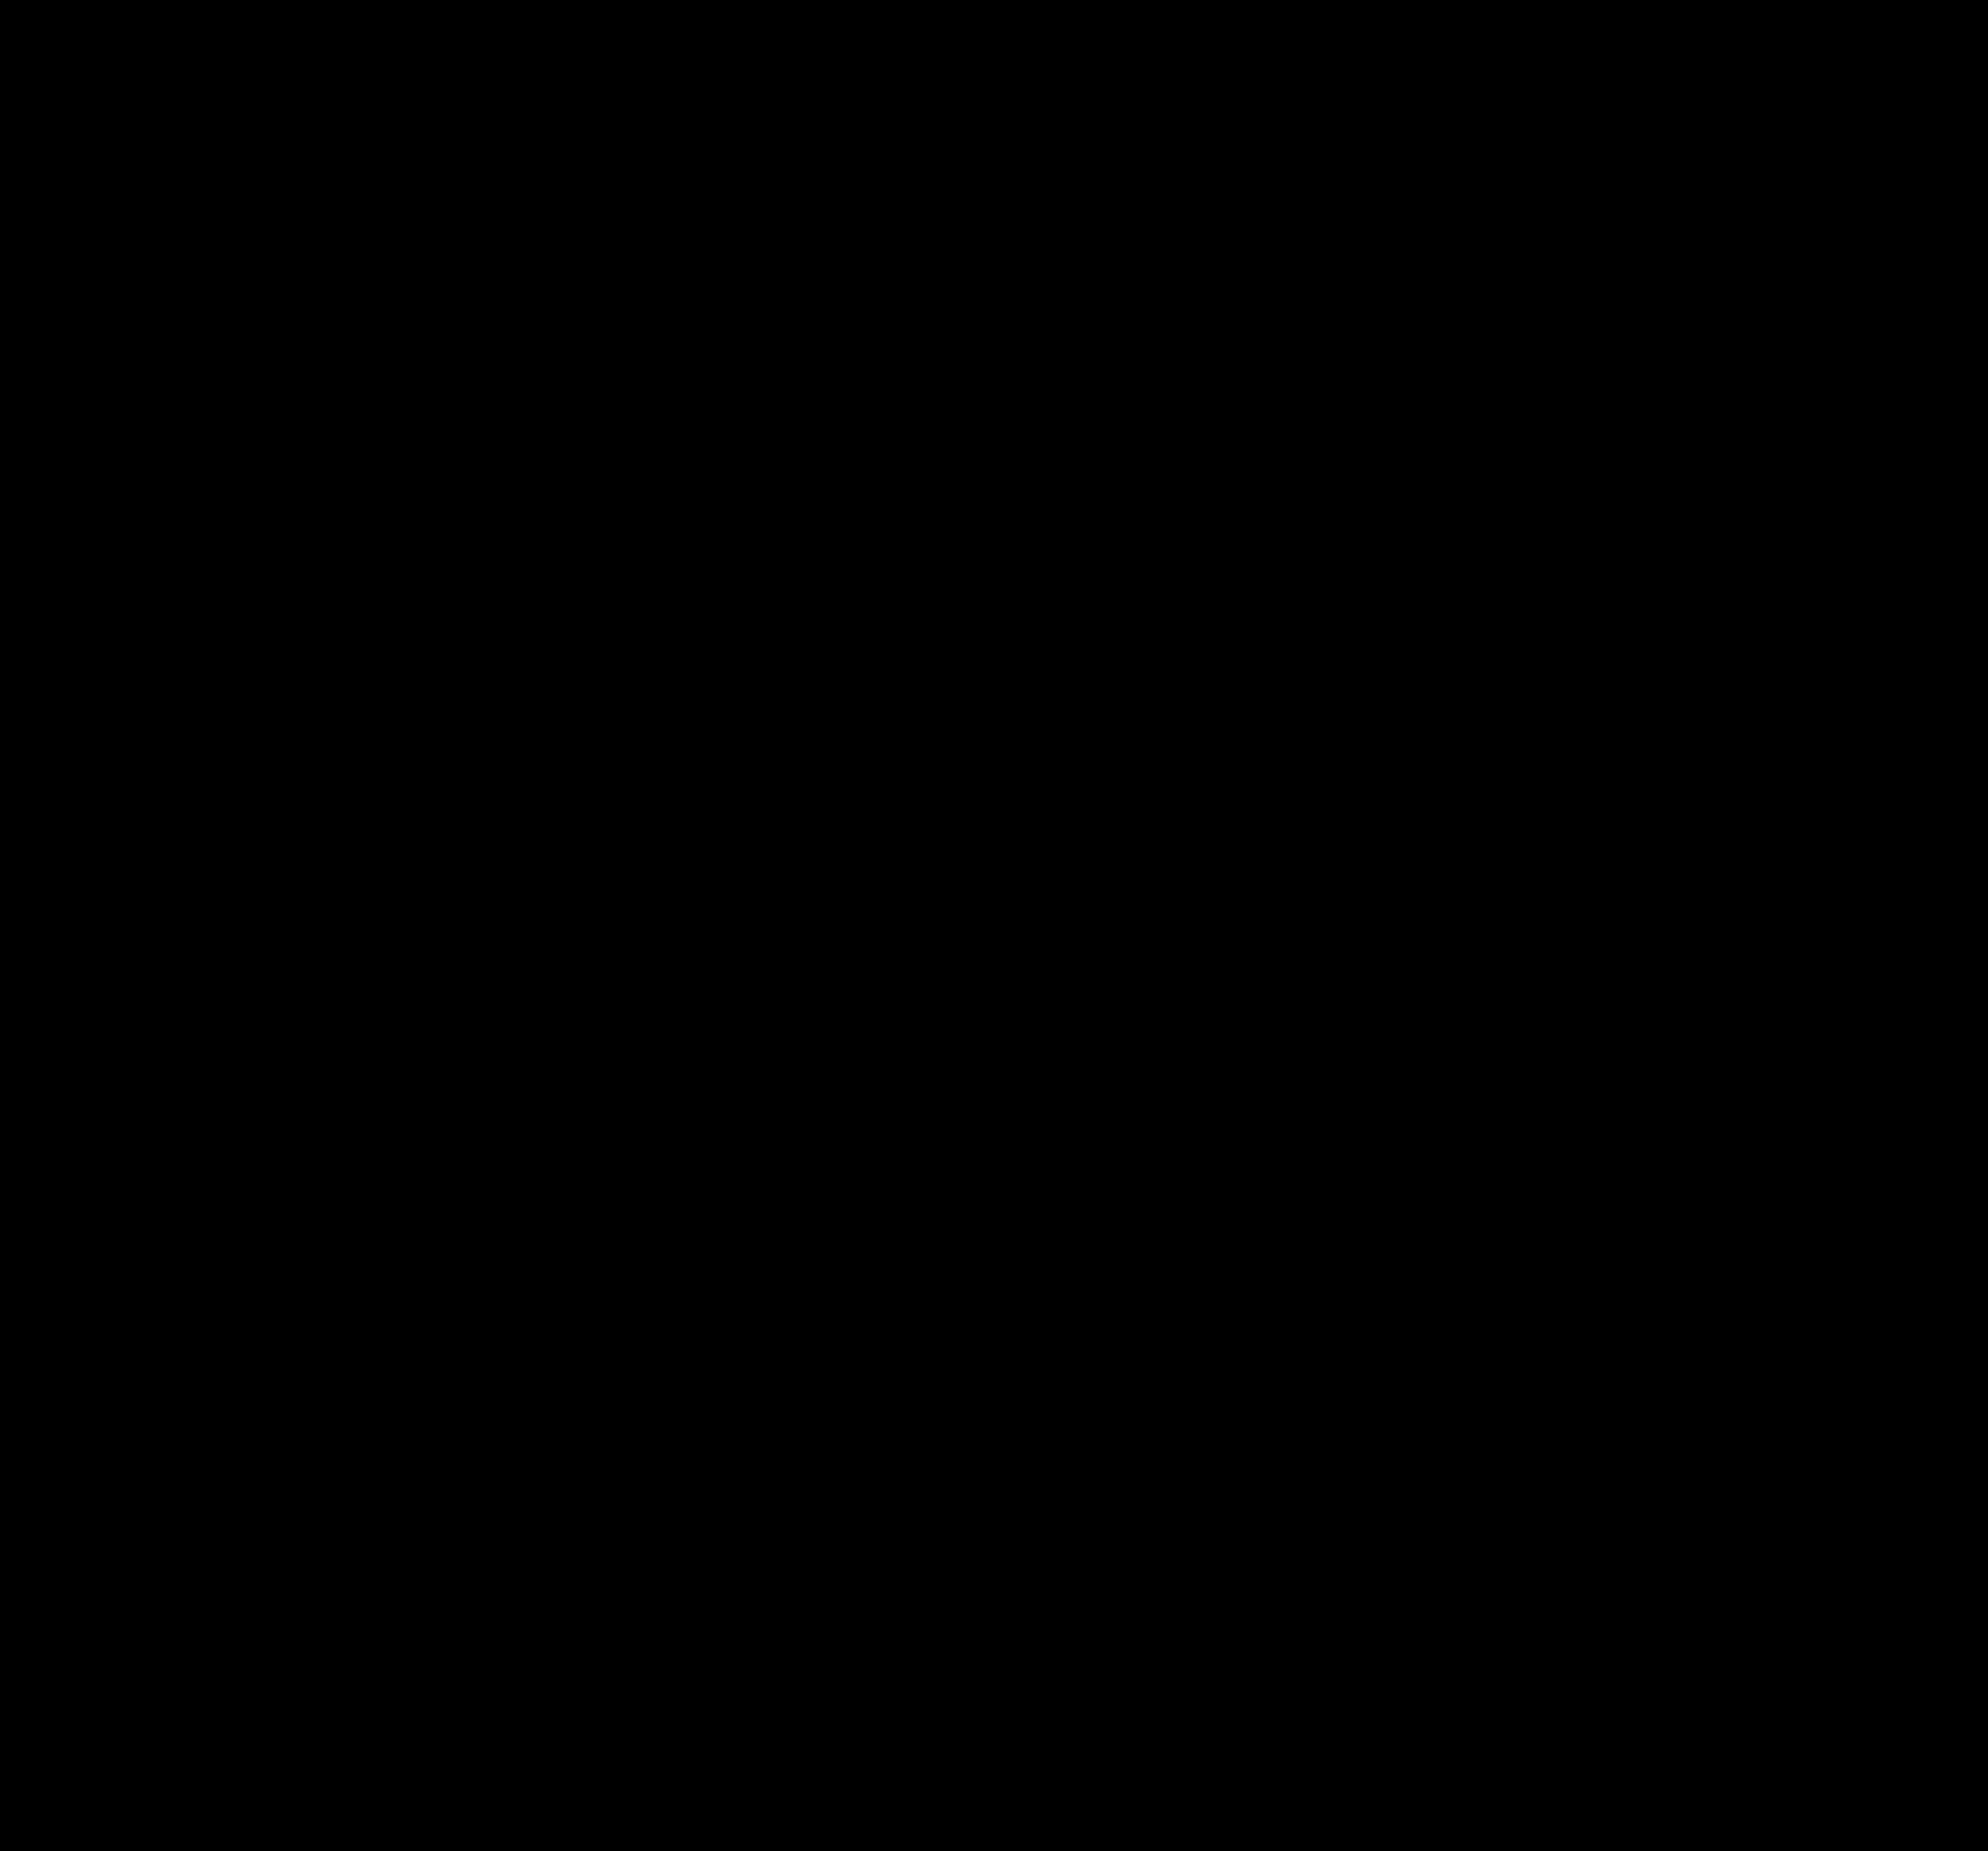 Outline. Australia clipart black and white